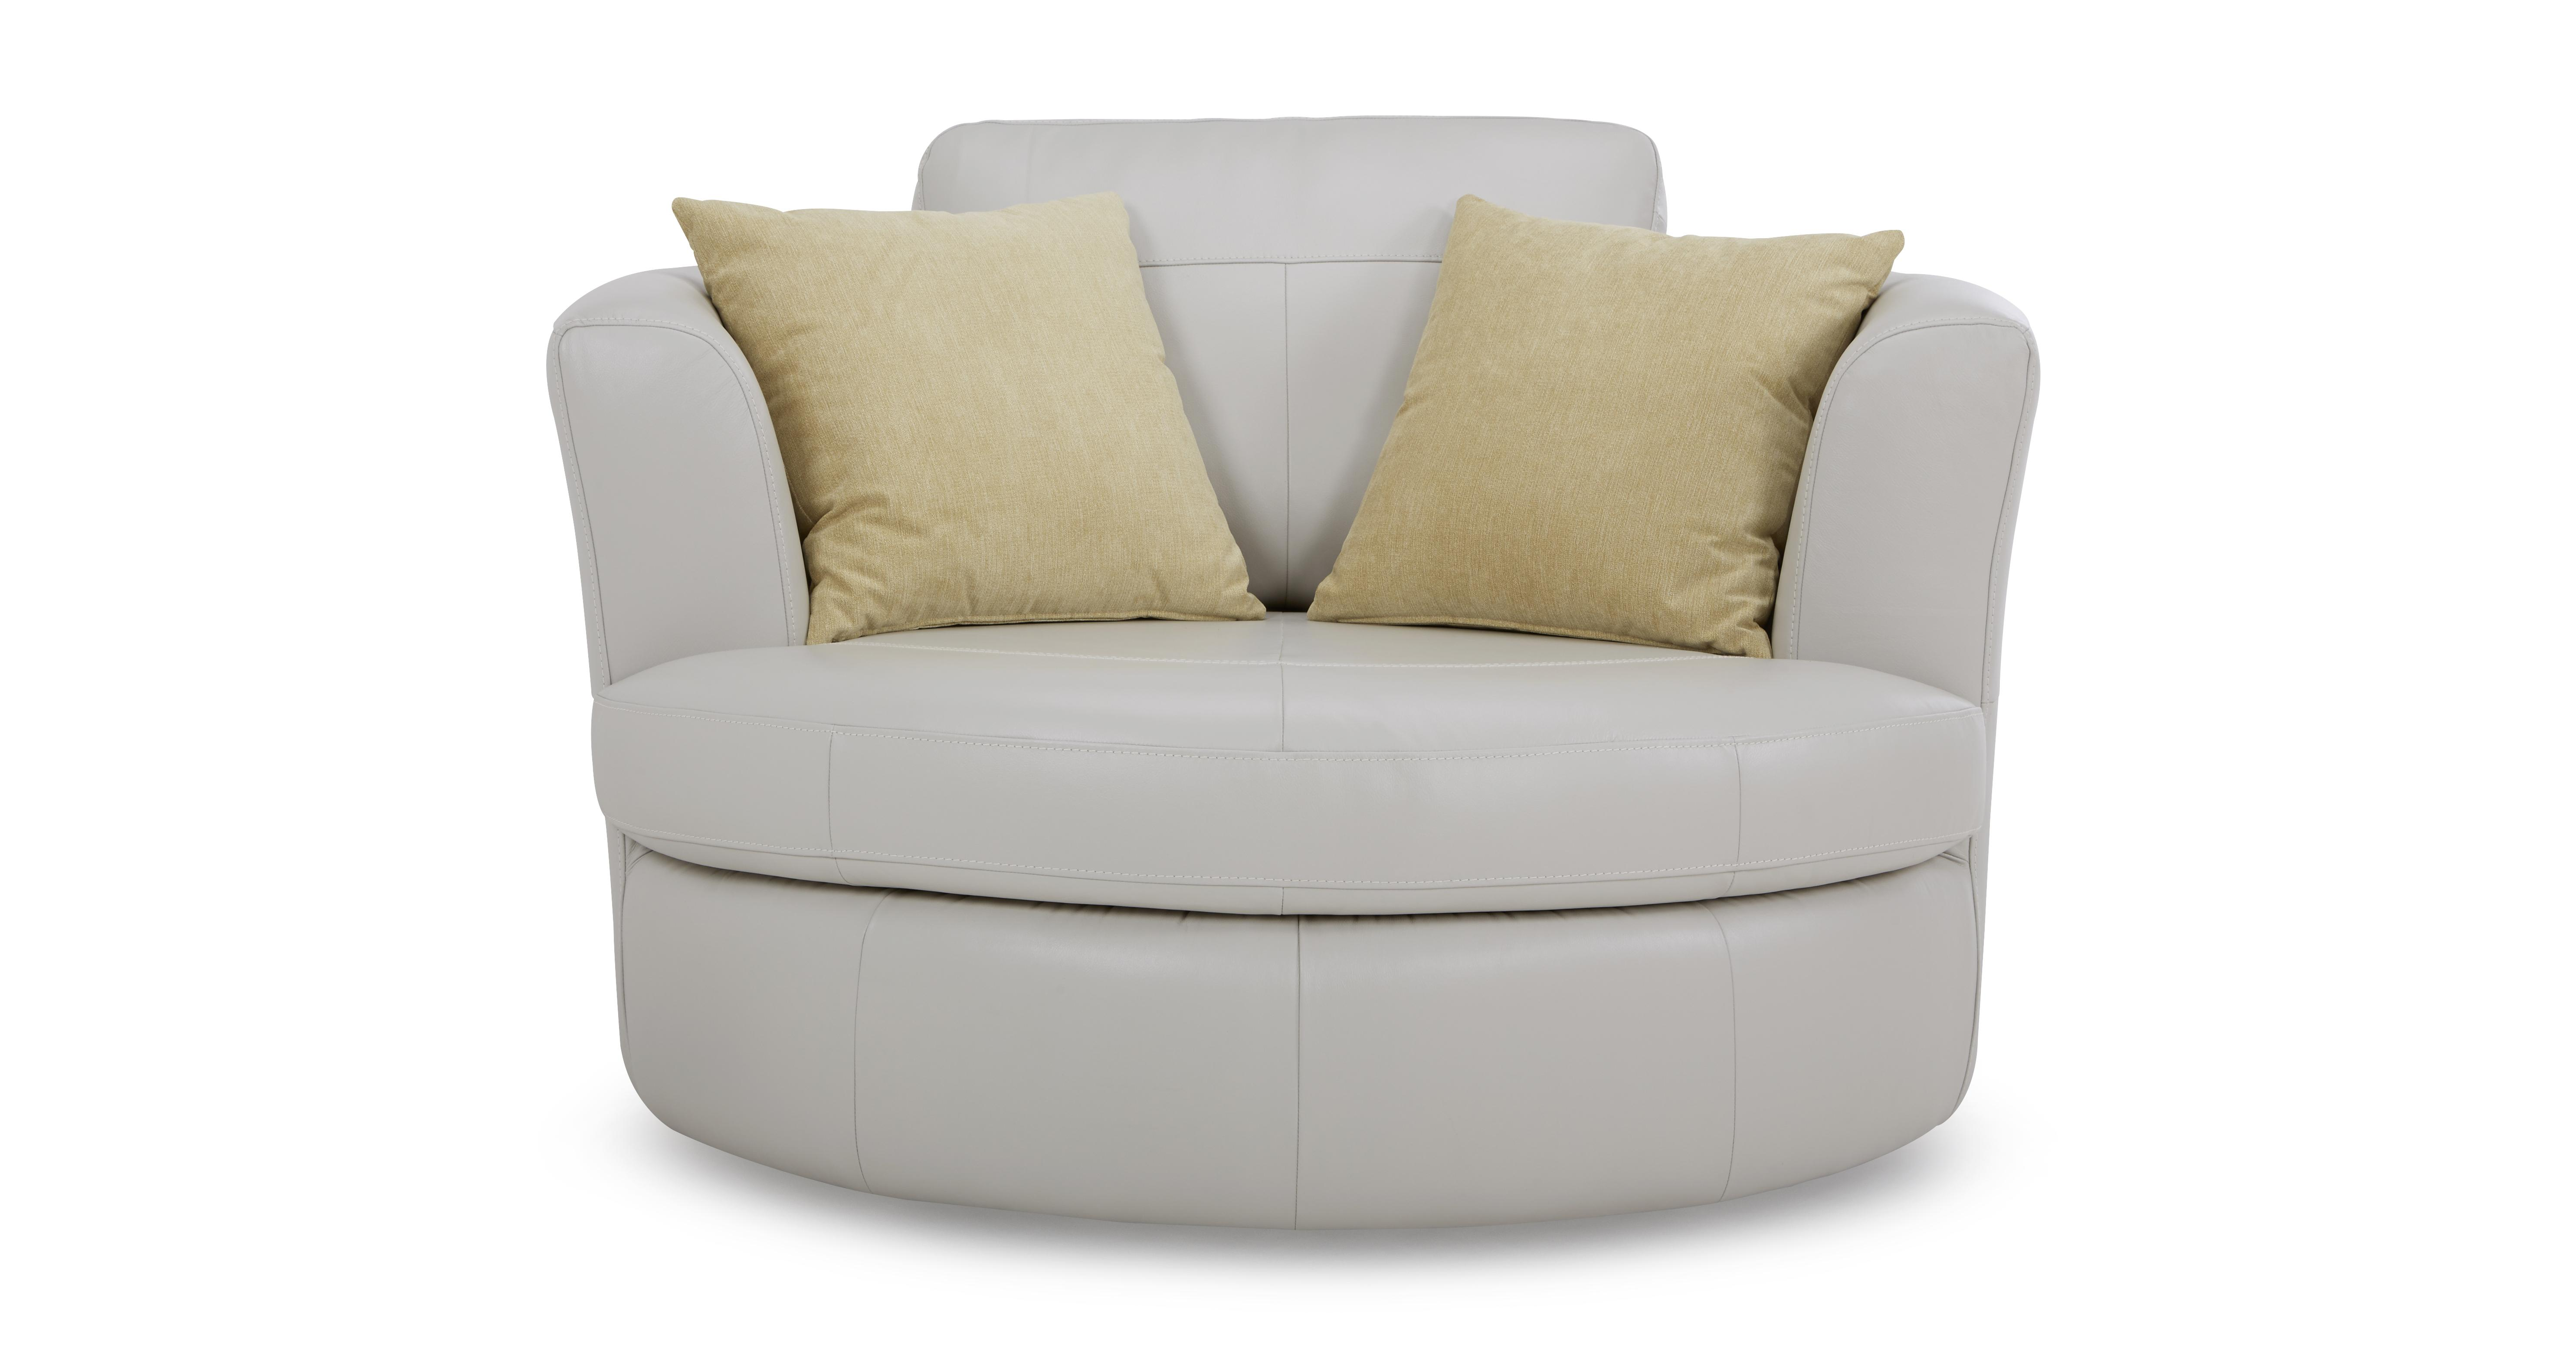 swivel chair ireland medical office in egypt dfs freya leather corner sofa baci living room